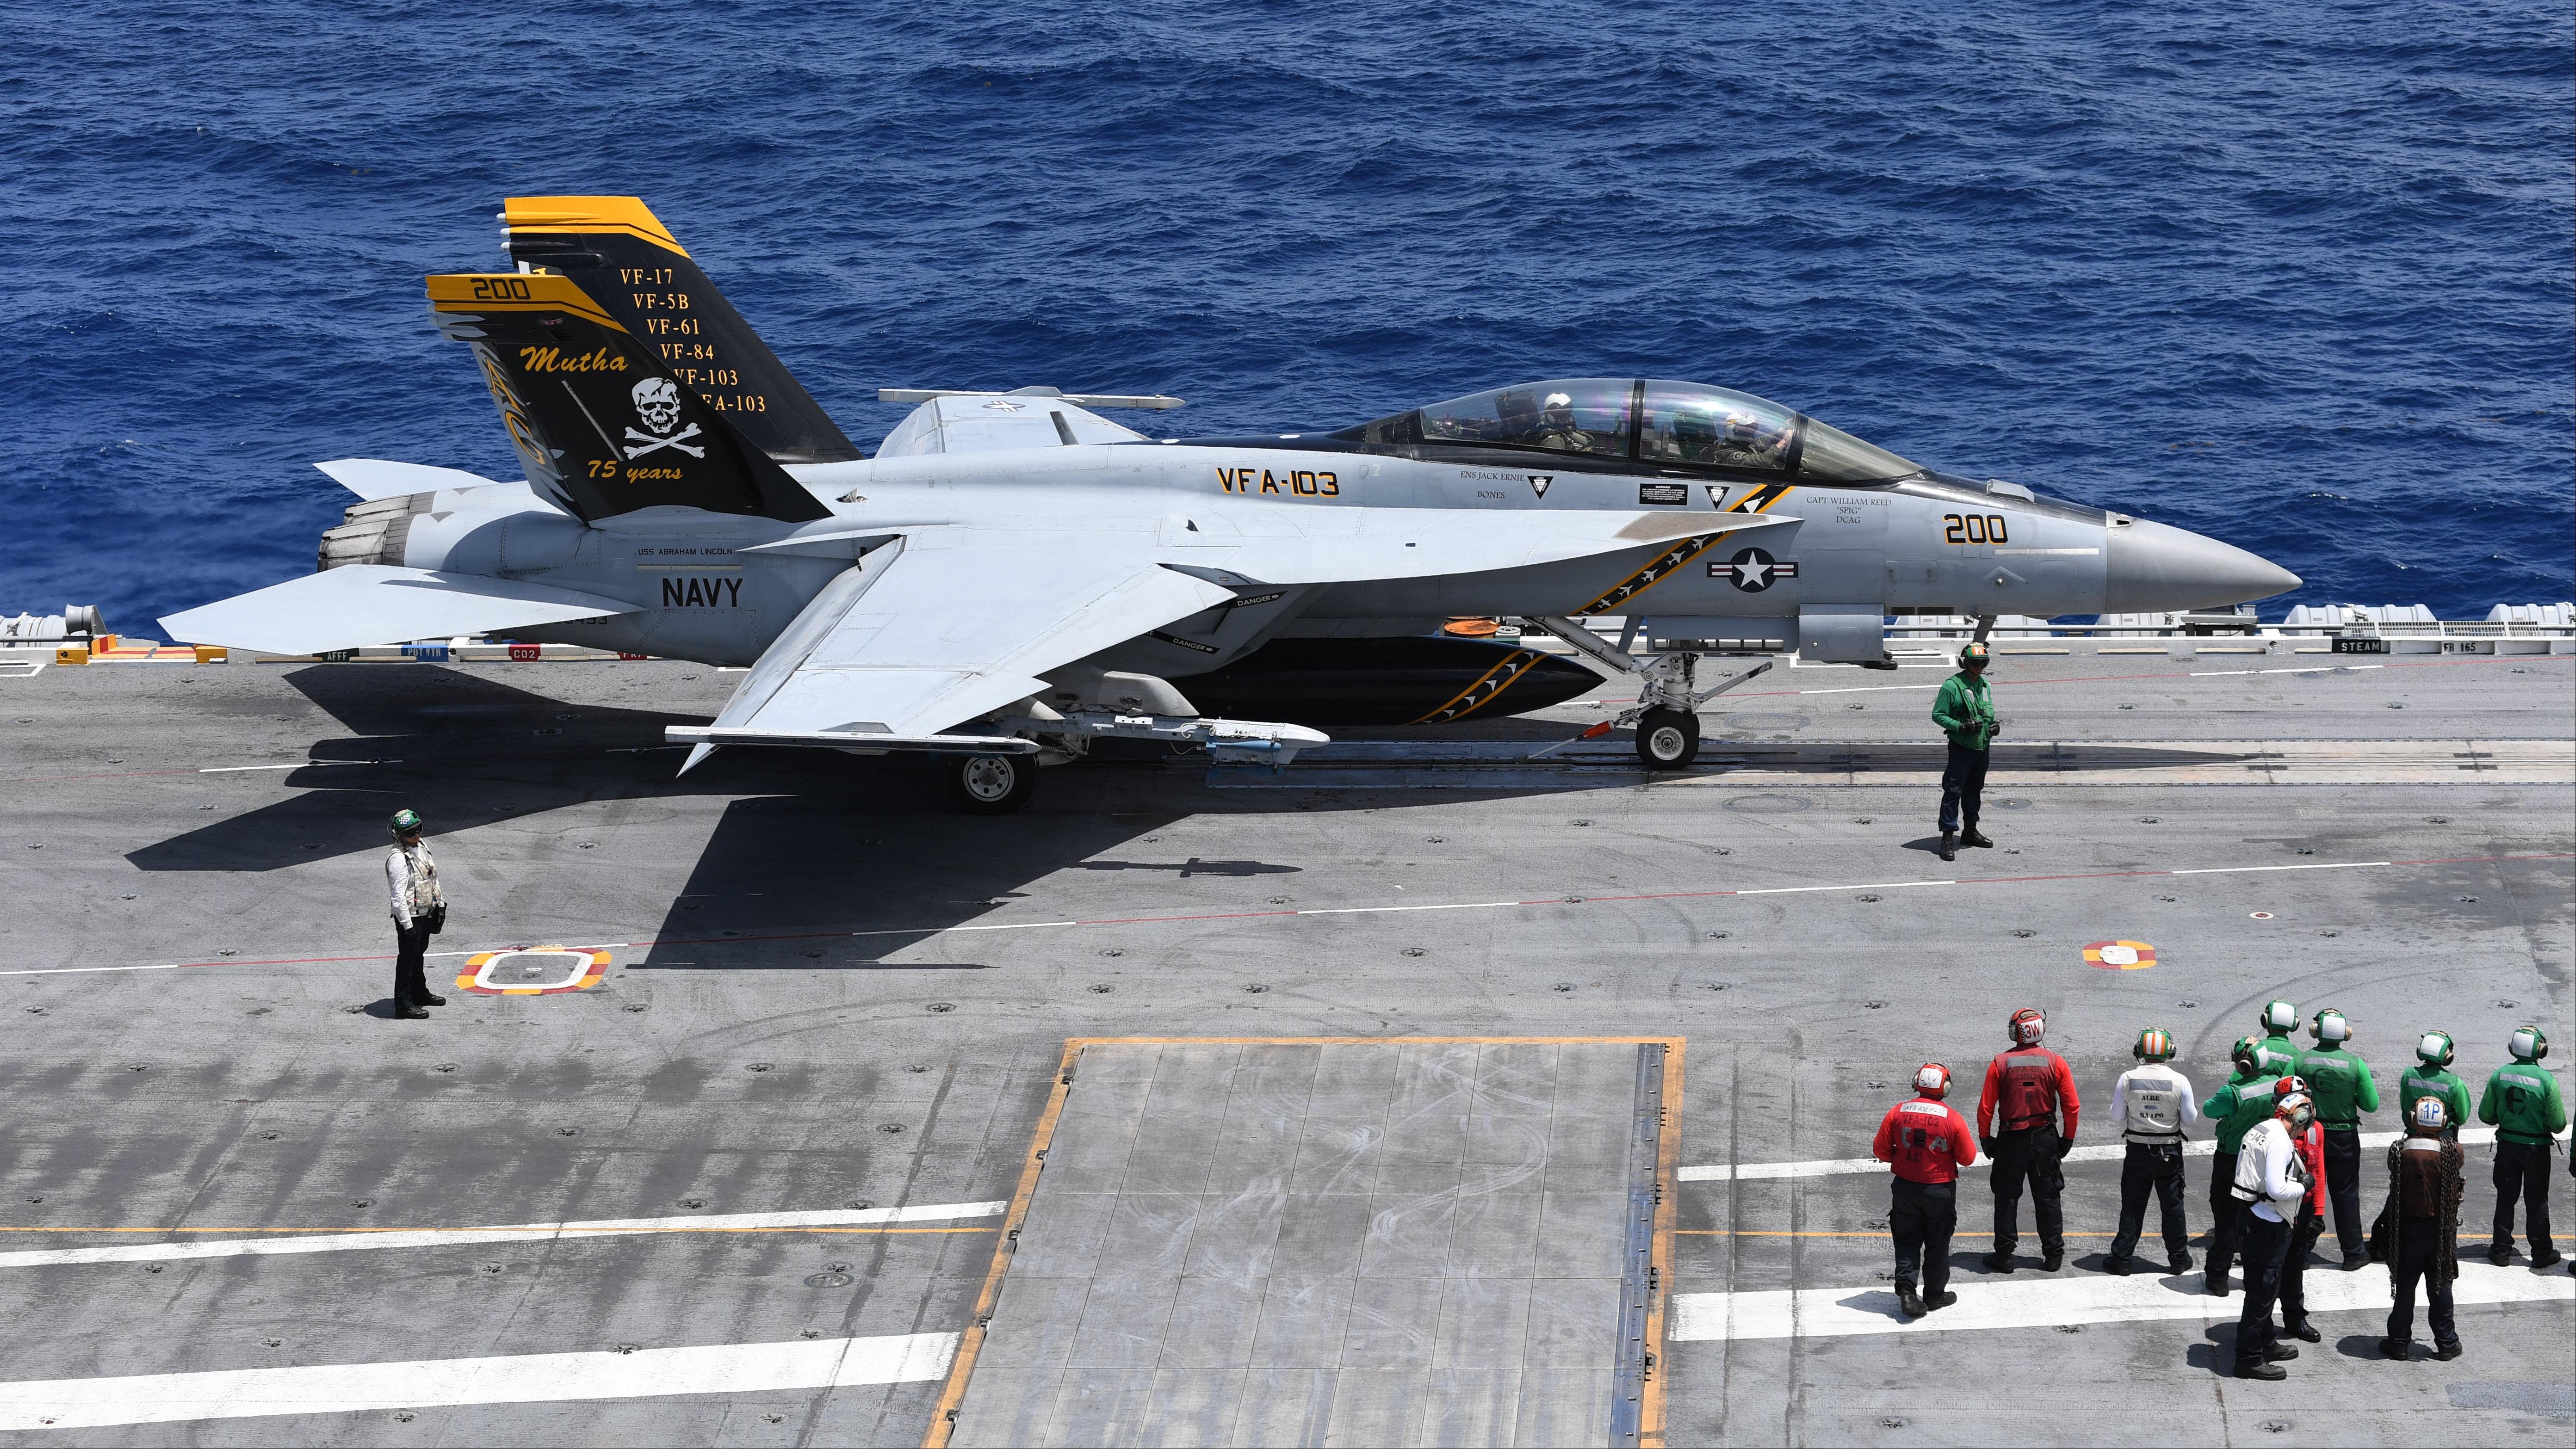 VFA-103 patch F-14 Tomcat Nimitz Jolly Rogers Cruise Mutha Battle US Navy CVW VF